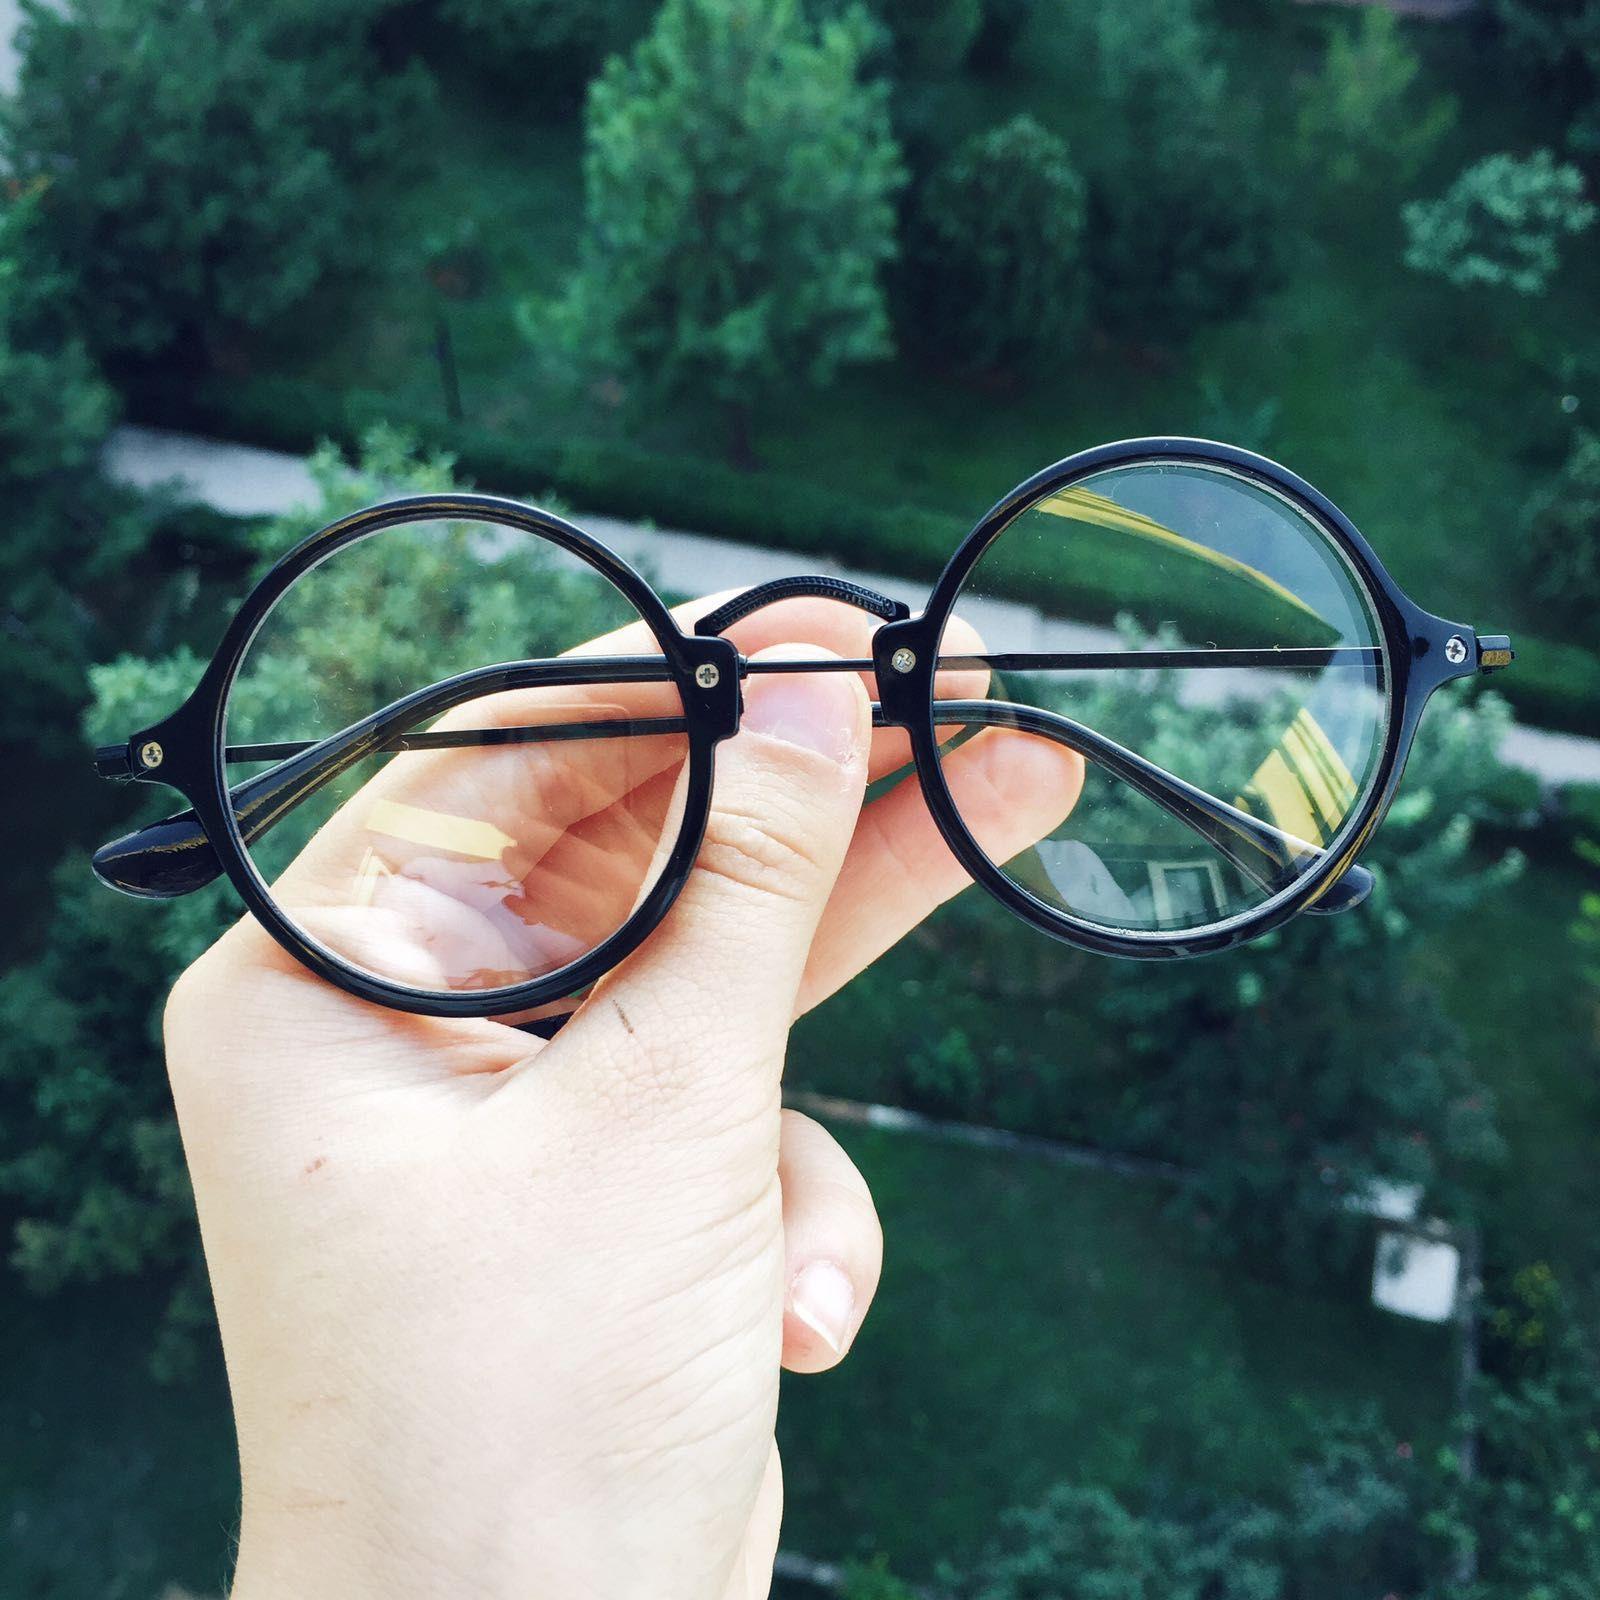 Pin De Hannabelle Notorious Em Roger Berry Em 2020 Oculos De